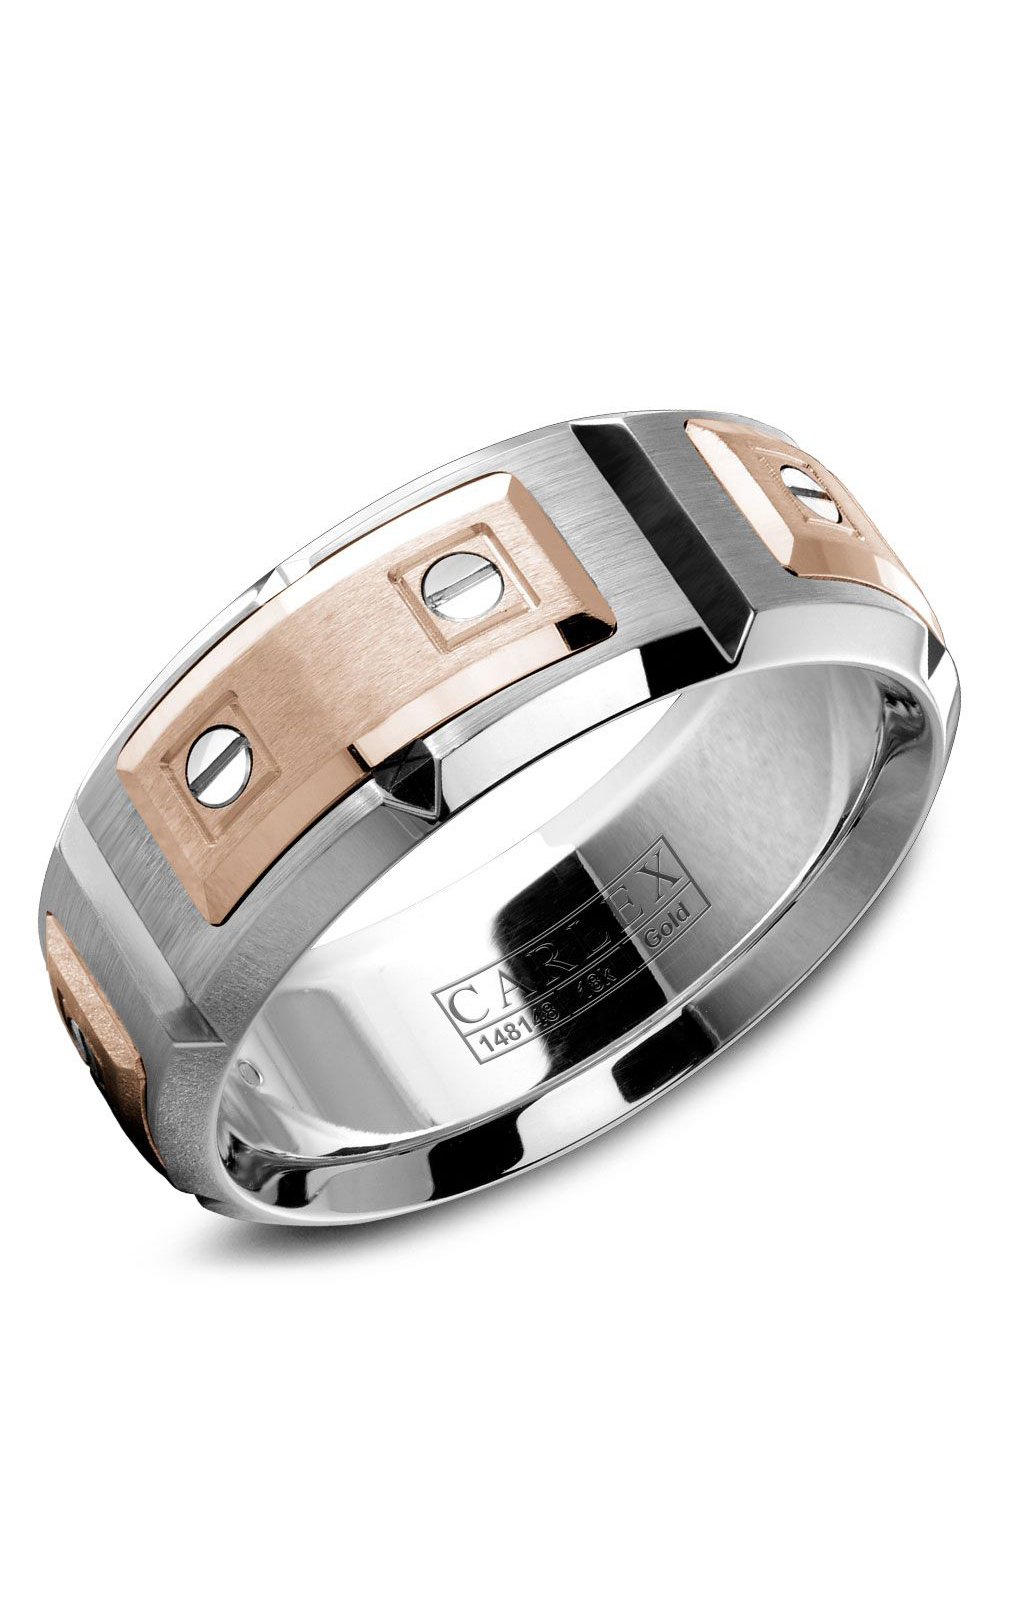 Carlex Sport WB-9852RC product image